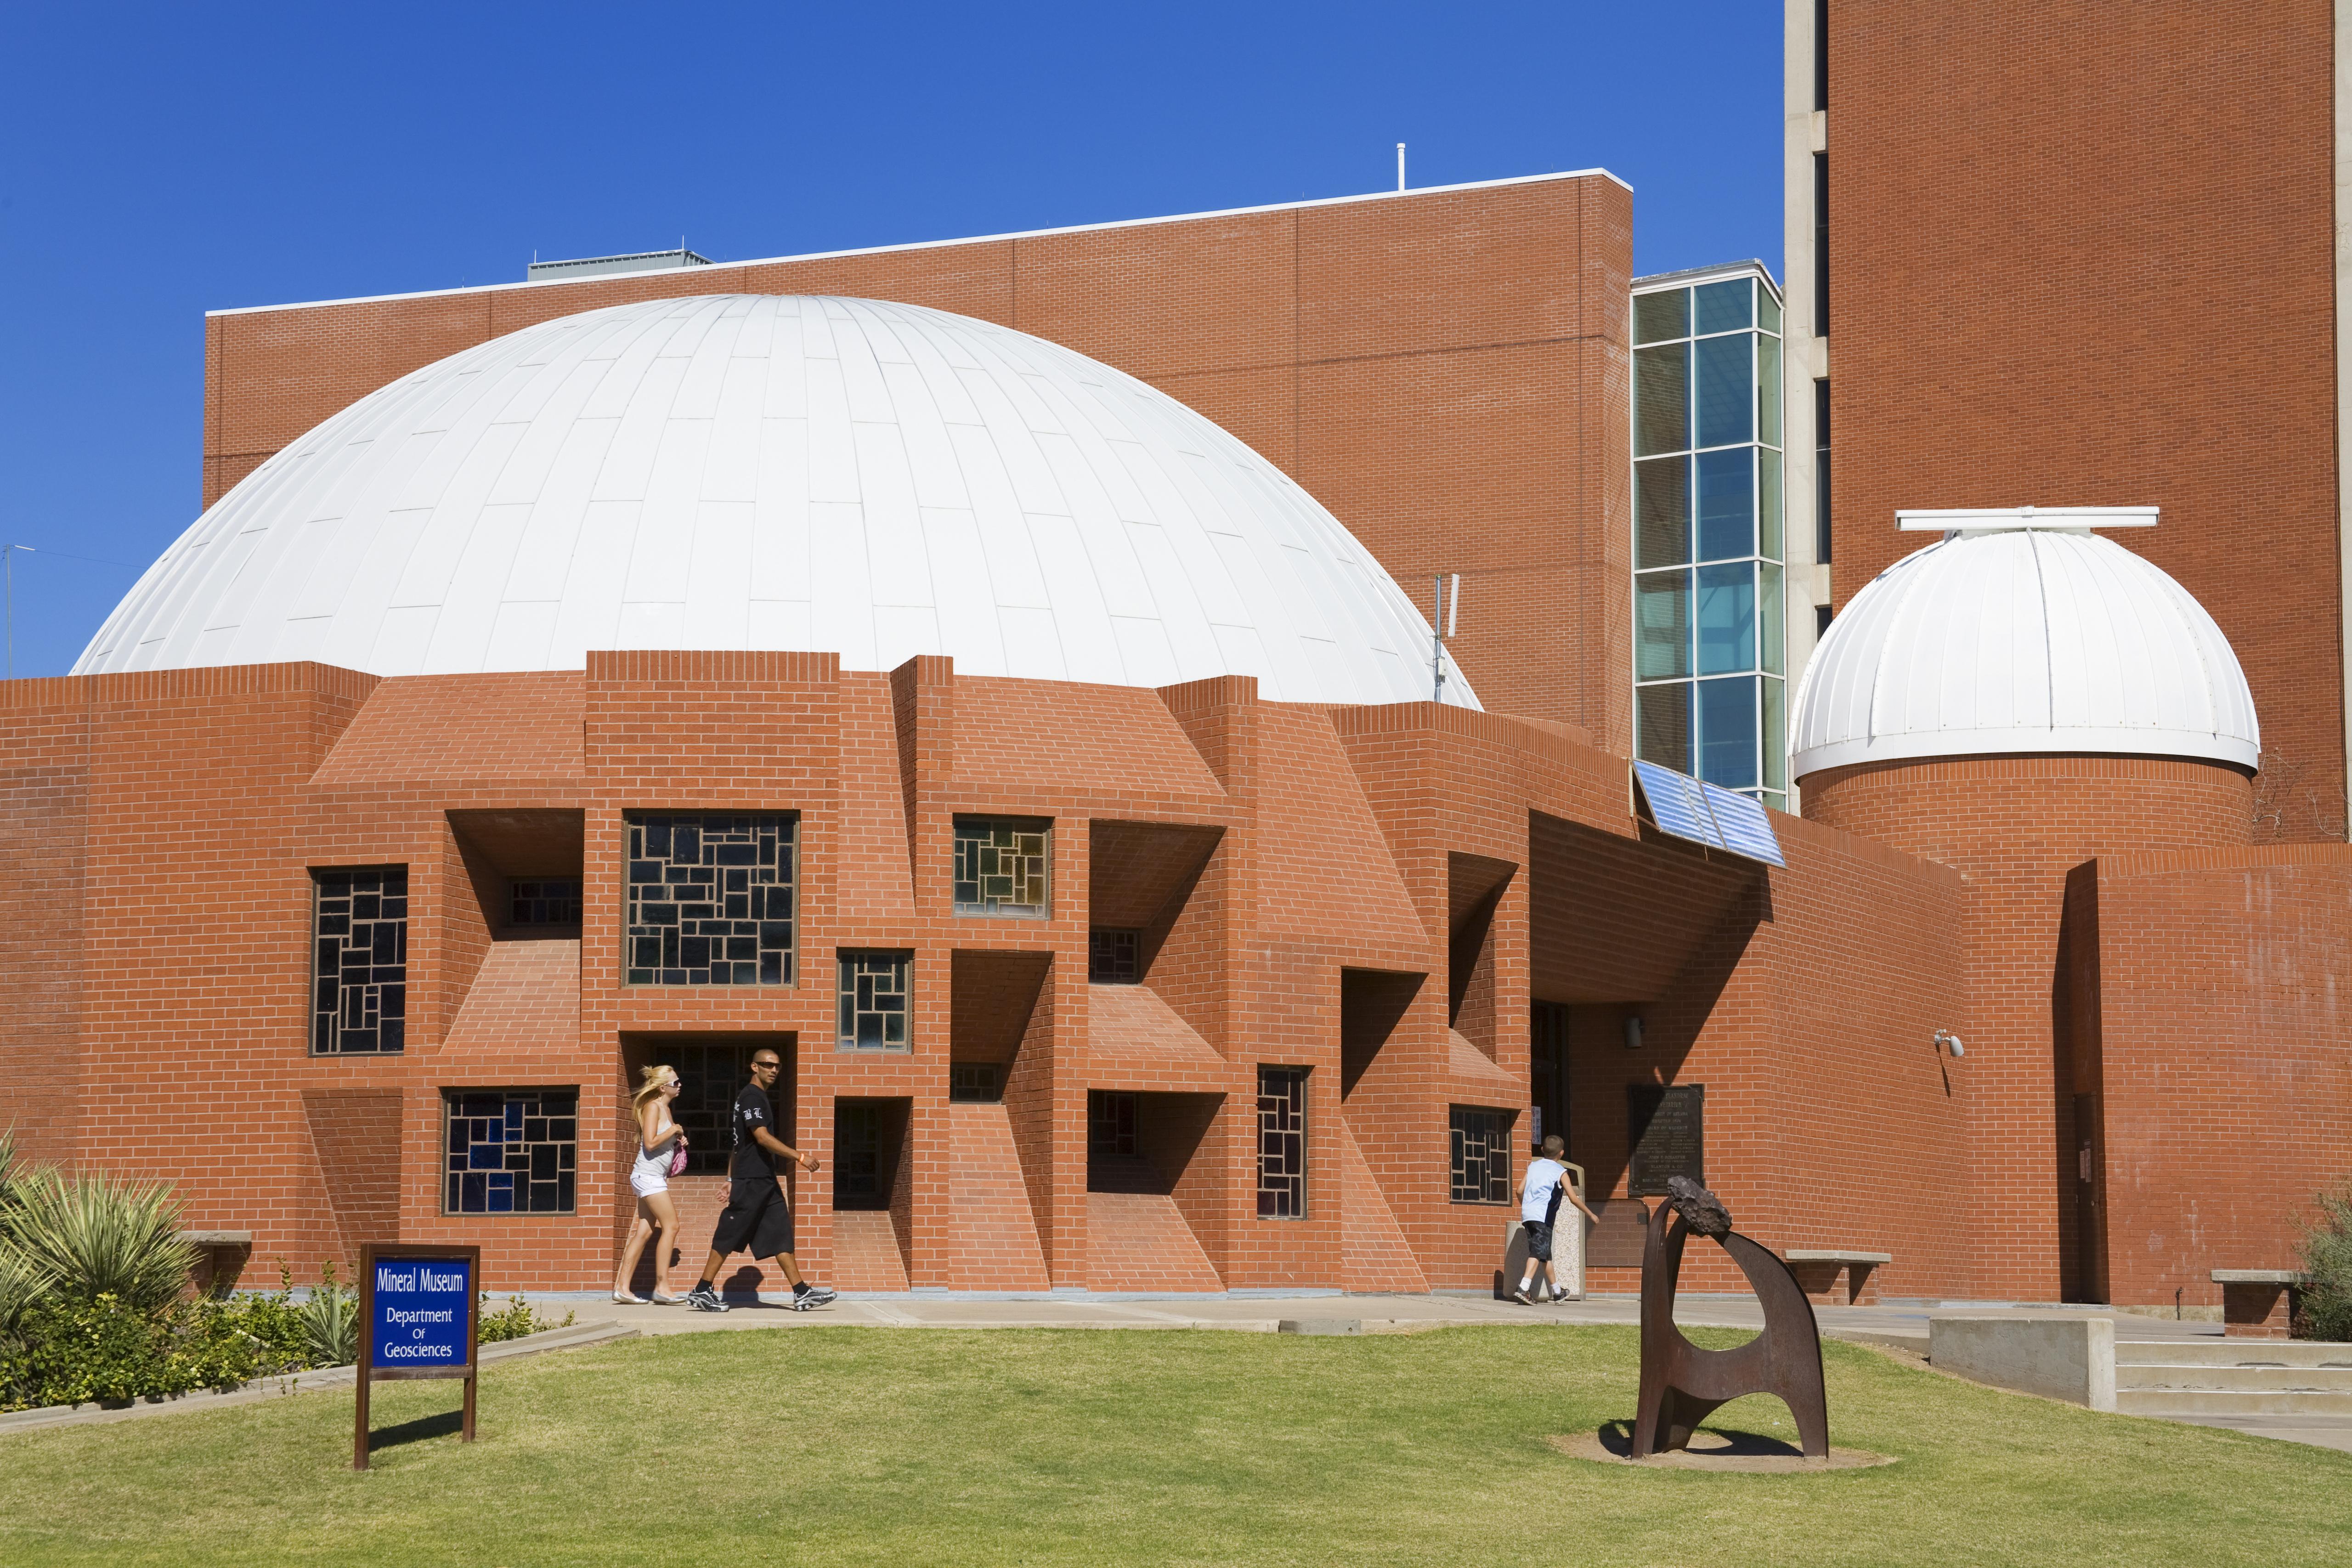 Flandrau Science Center and Planetarium on campus of the University of Arizona.